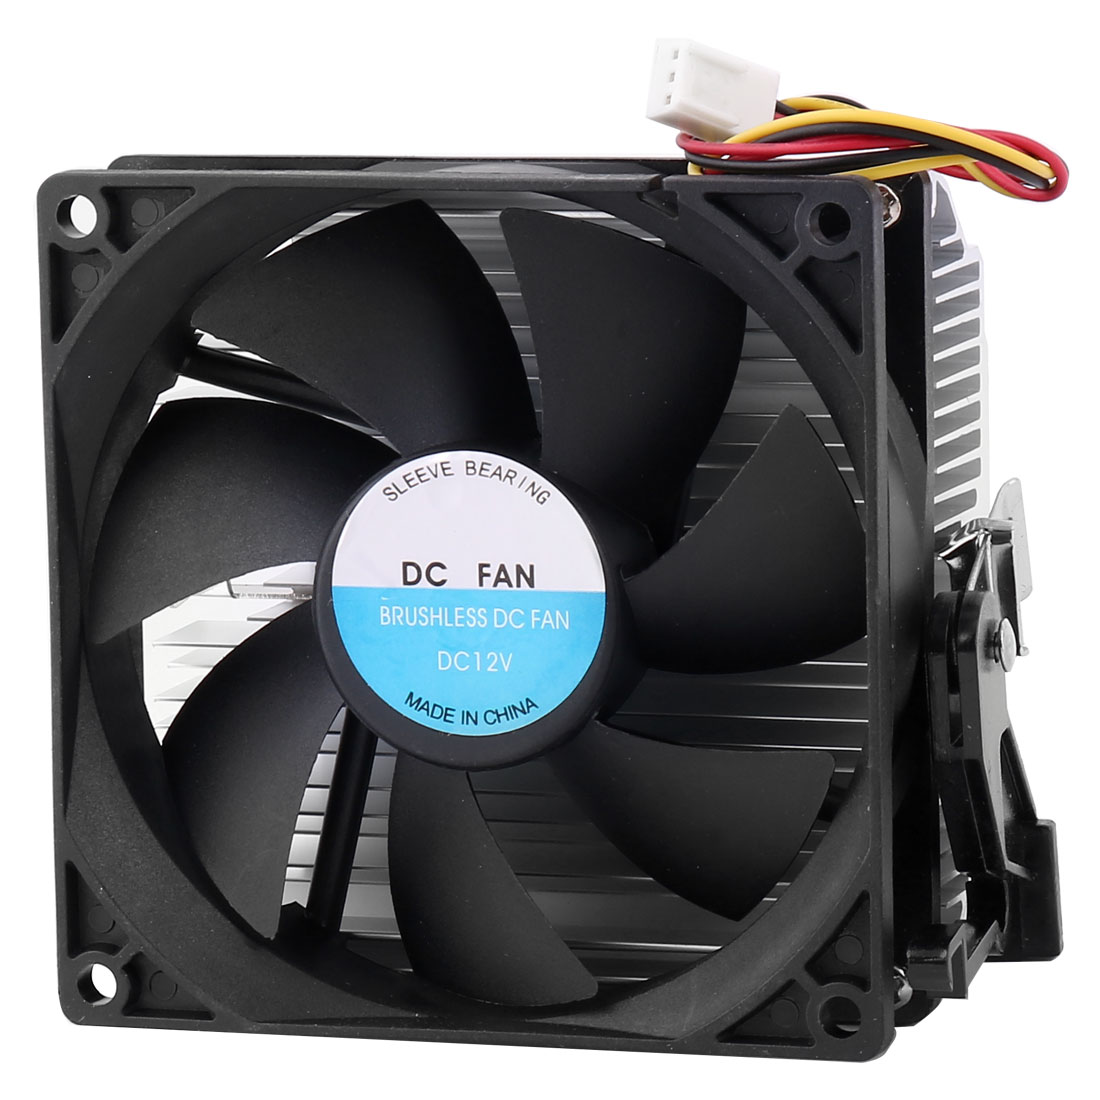 Black Silver Tone 3 Poles Connector CPU Cooling Fan Heatsink for Desktop